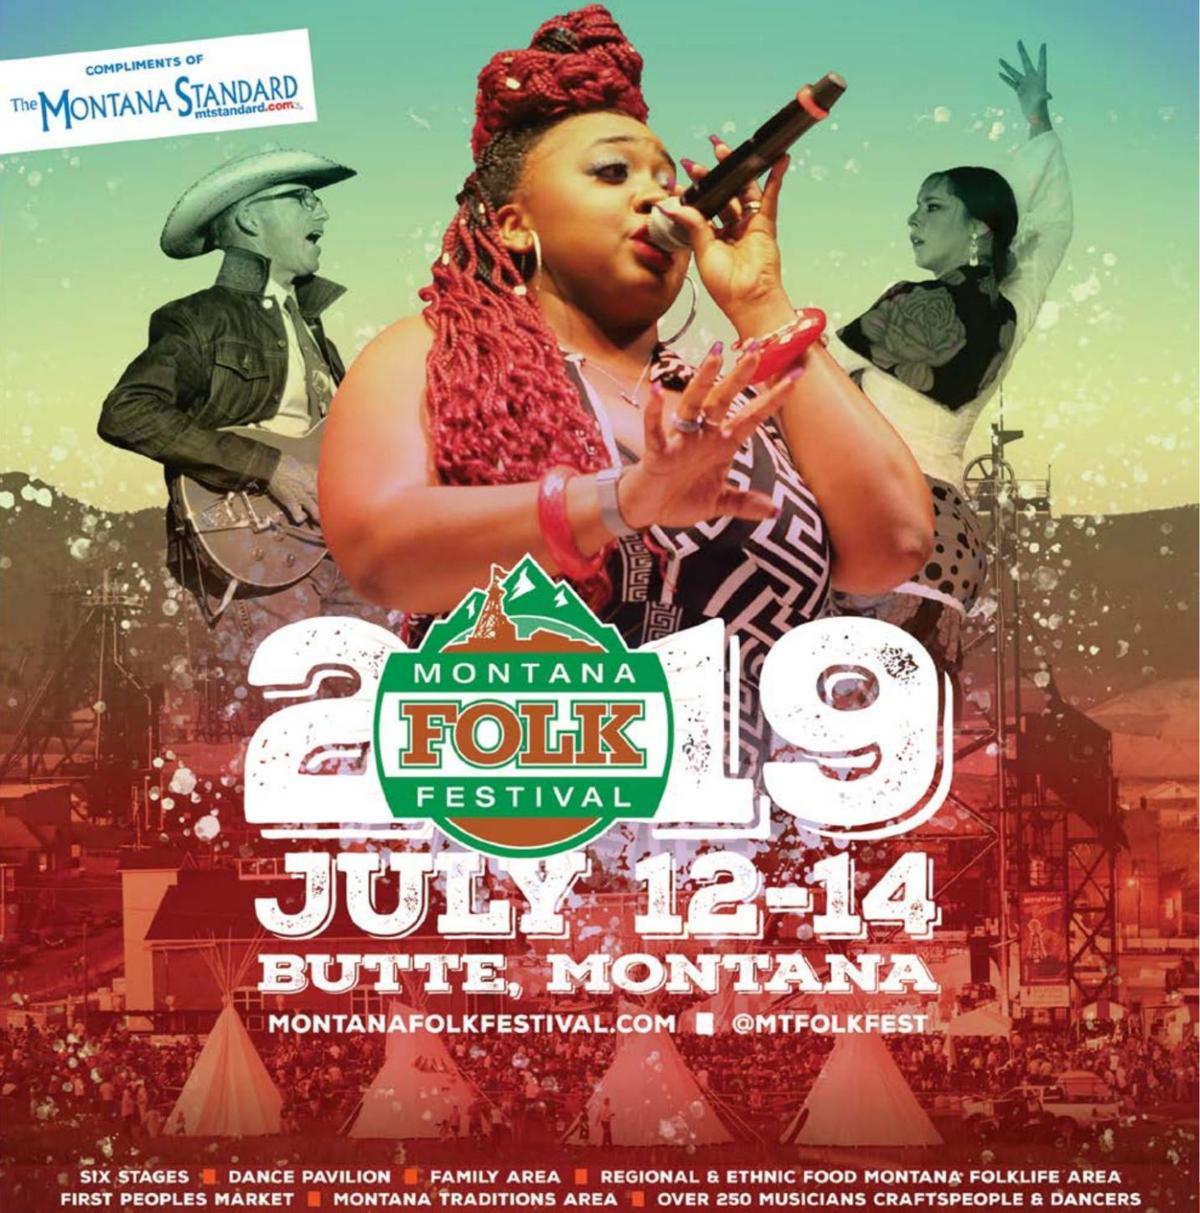 Montana Folk Festival Guide 2019